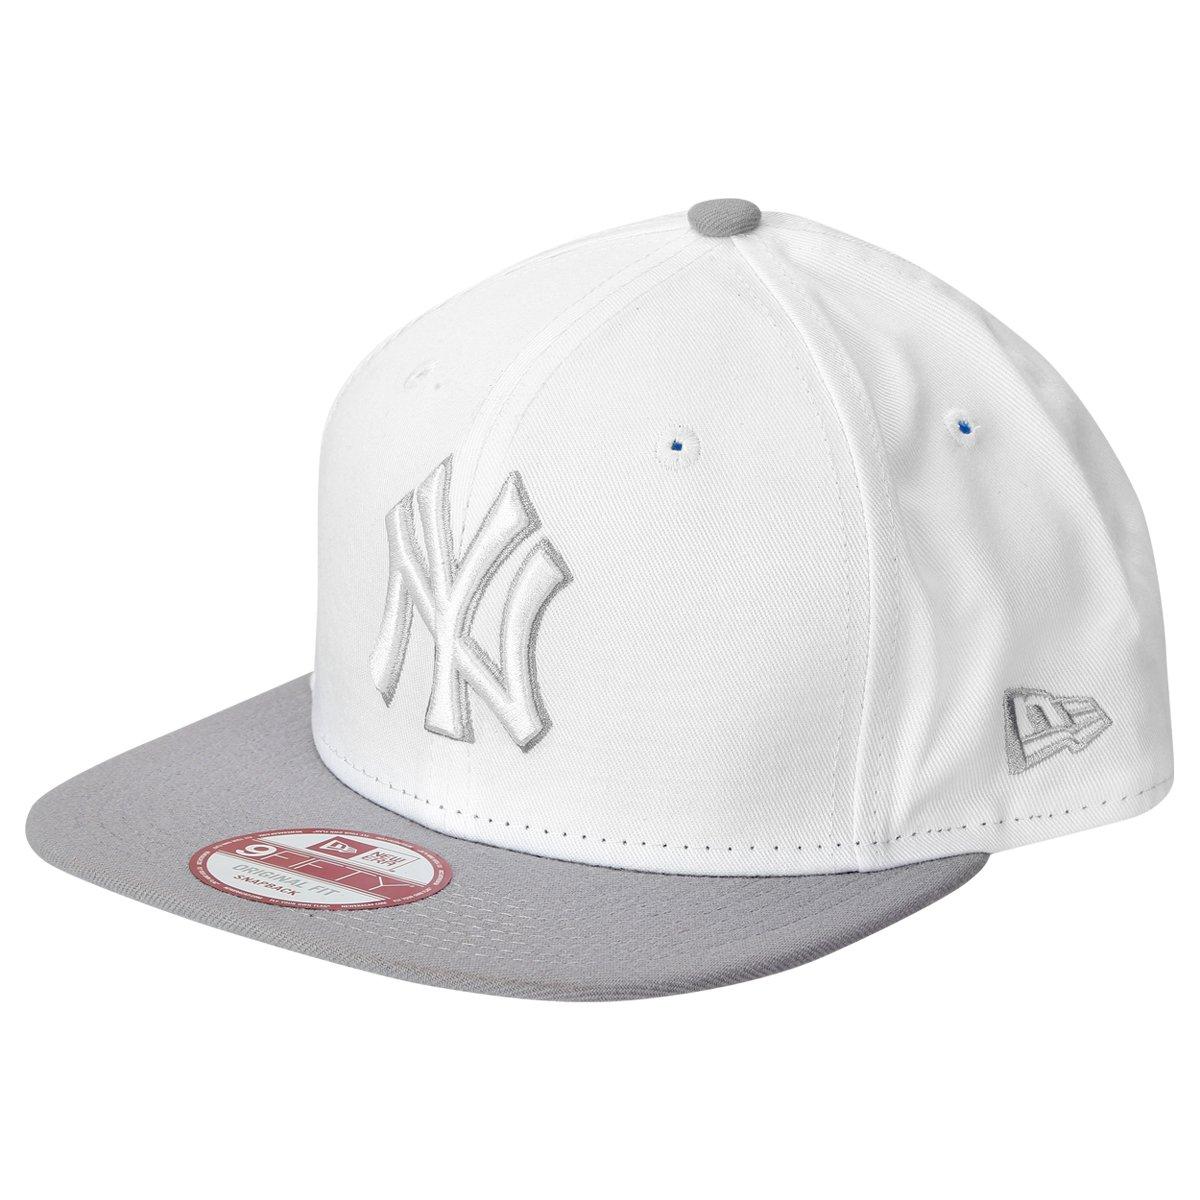 Boné New Era 950 New York Yankees - Compre Agora  839b55ddaeb